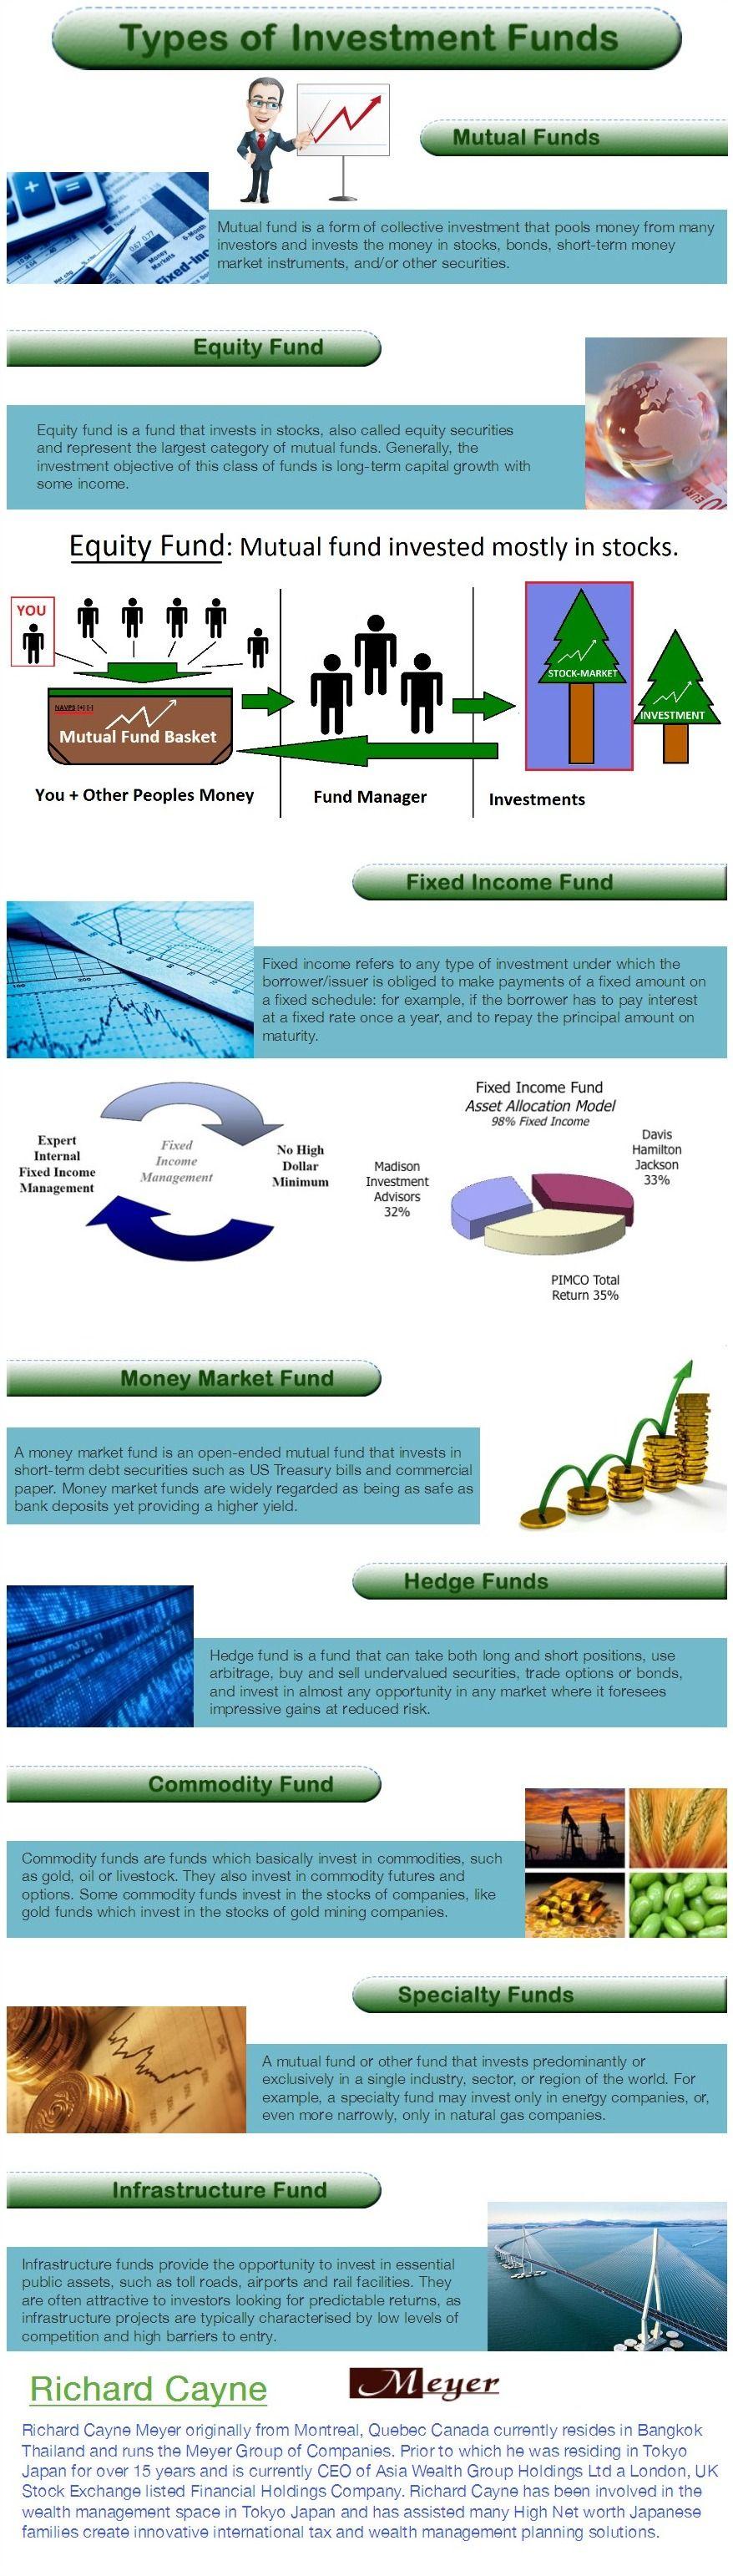 Meyer Asset Management Ltd Tokyo Types Of Investment Funds